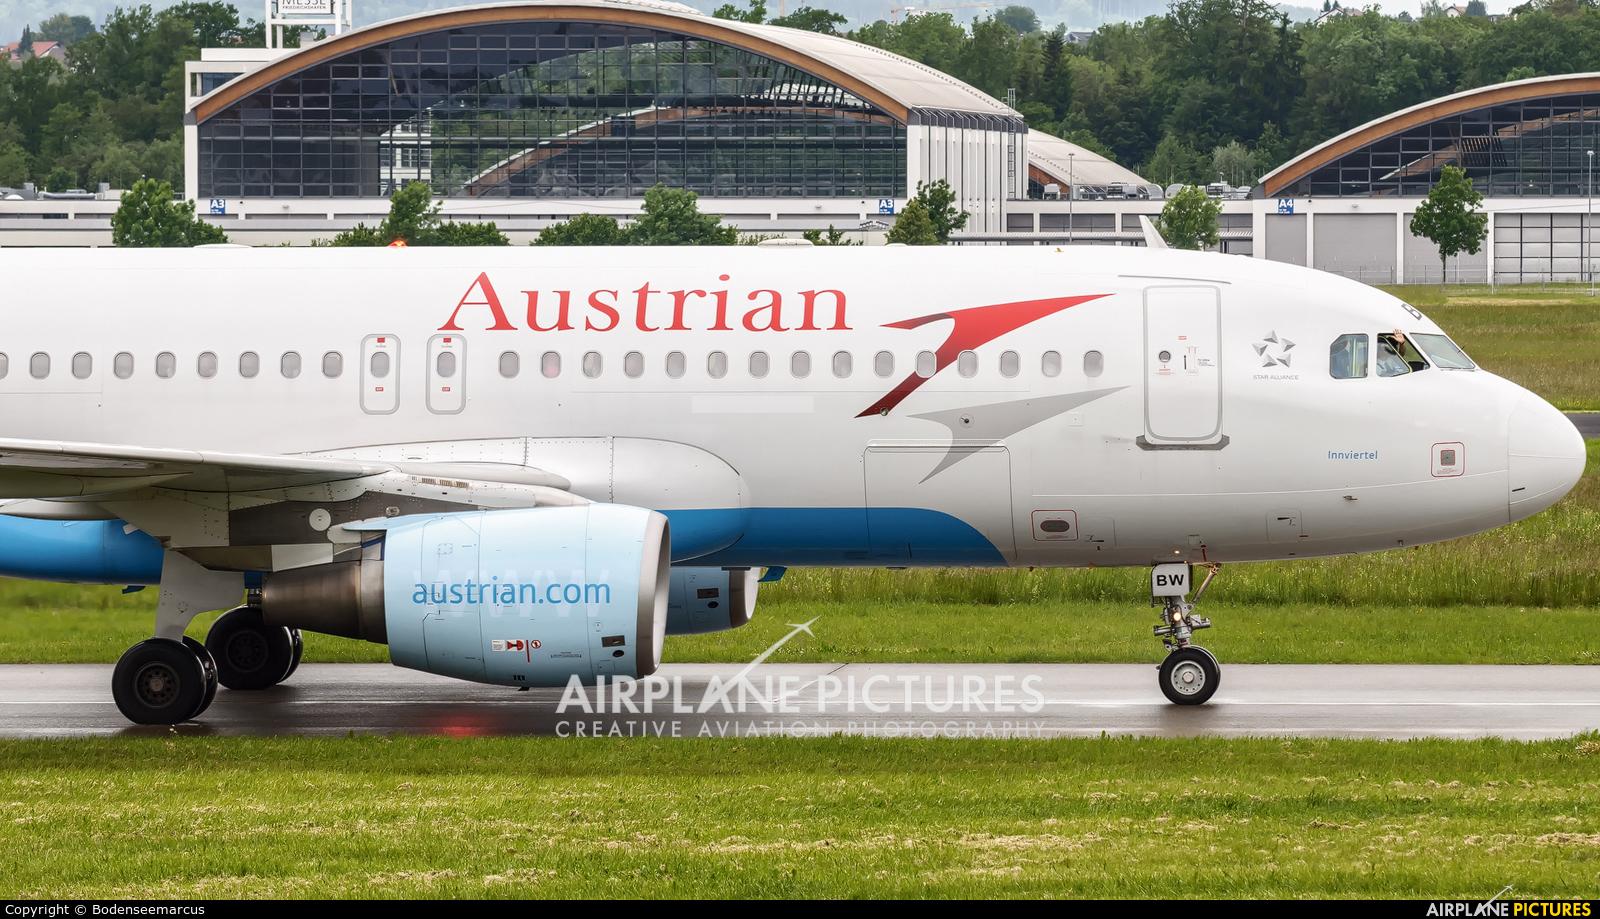 Austrian Airlines/Arrows/Tyrolean OE-LBW aircraft at Friedrichshafen